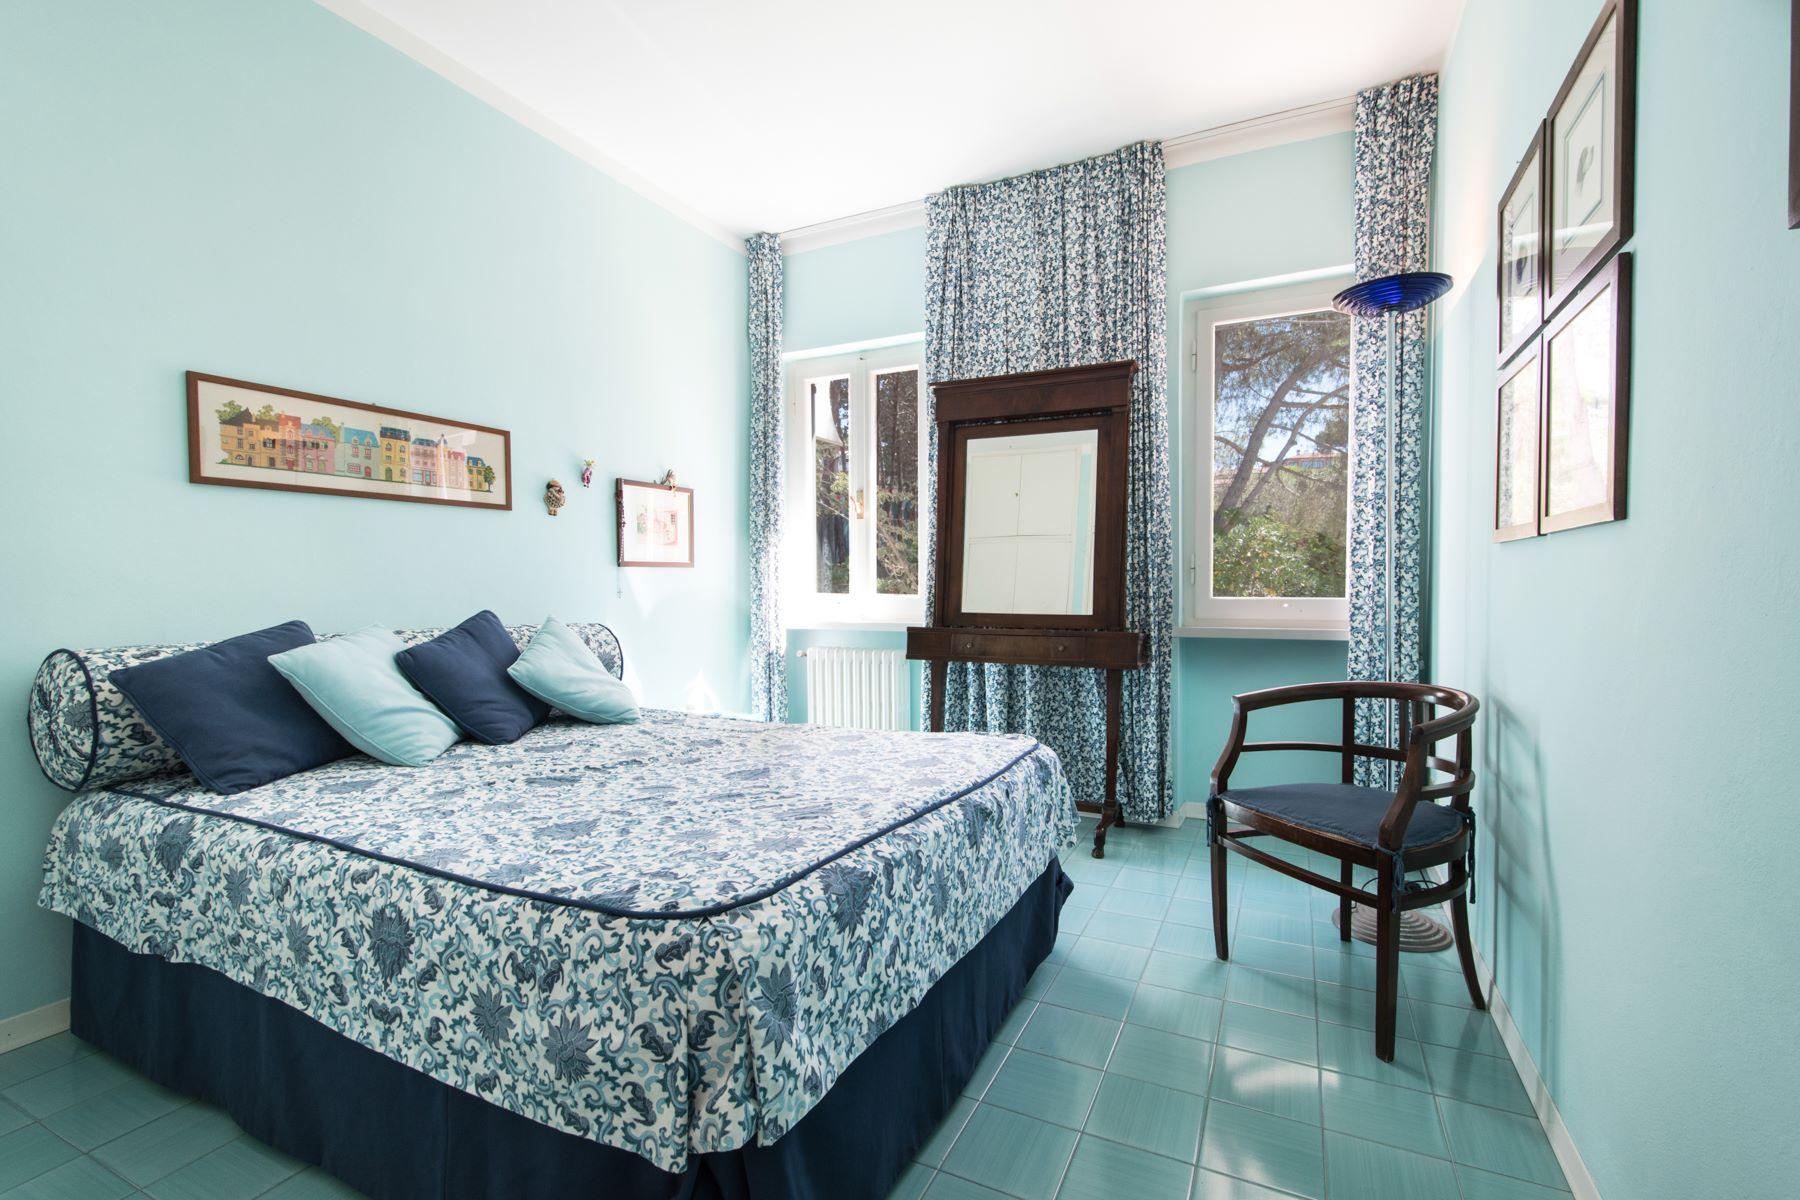 Additional photo for property listing at Unique beachfront villa with pool Via Einaudi Portoferraio, Livorno 57014 Italien